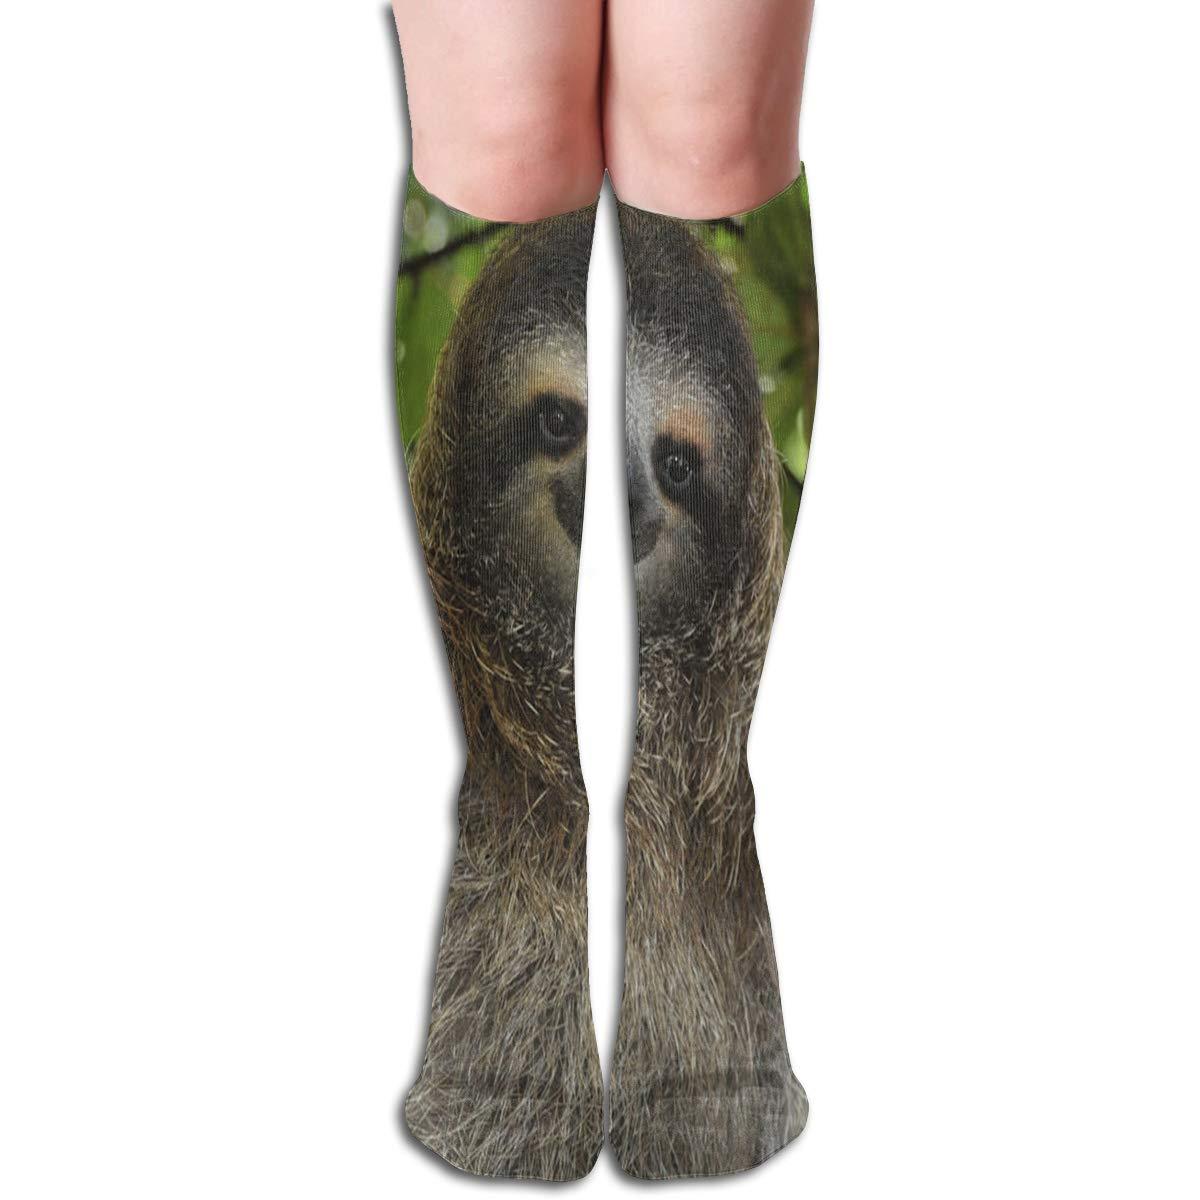 Girls Socks Over Knee Smathers Beach Palm Tree Winter Cool For Halloween